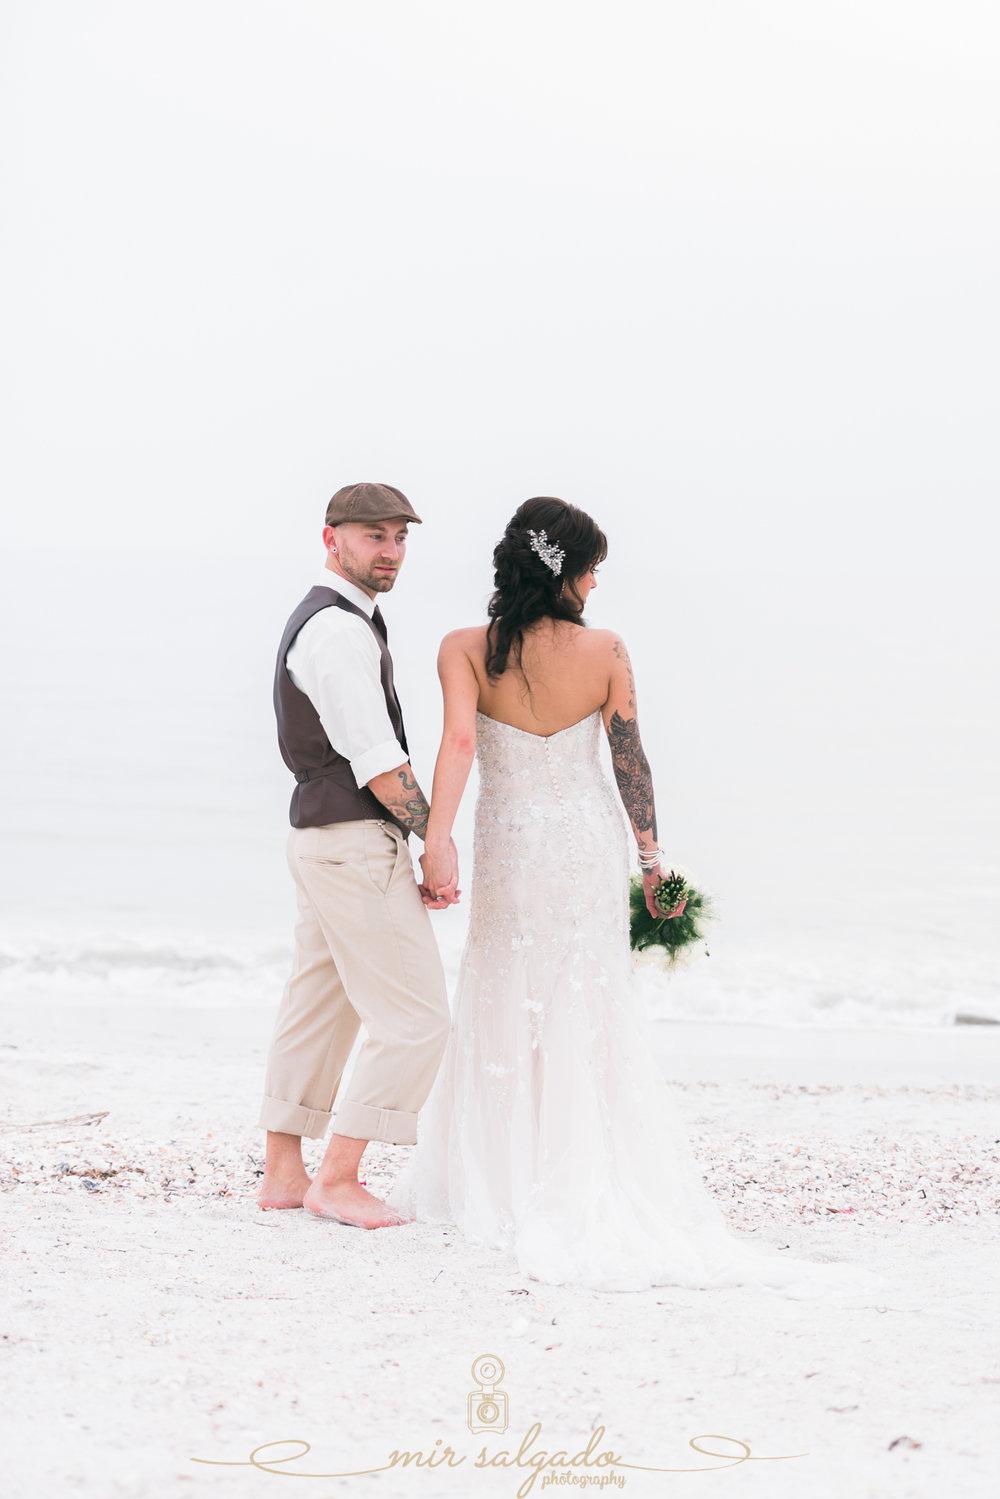 Florida-beach-wedding-photo, bride-and-groom-at-the-beach